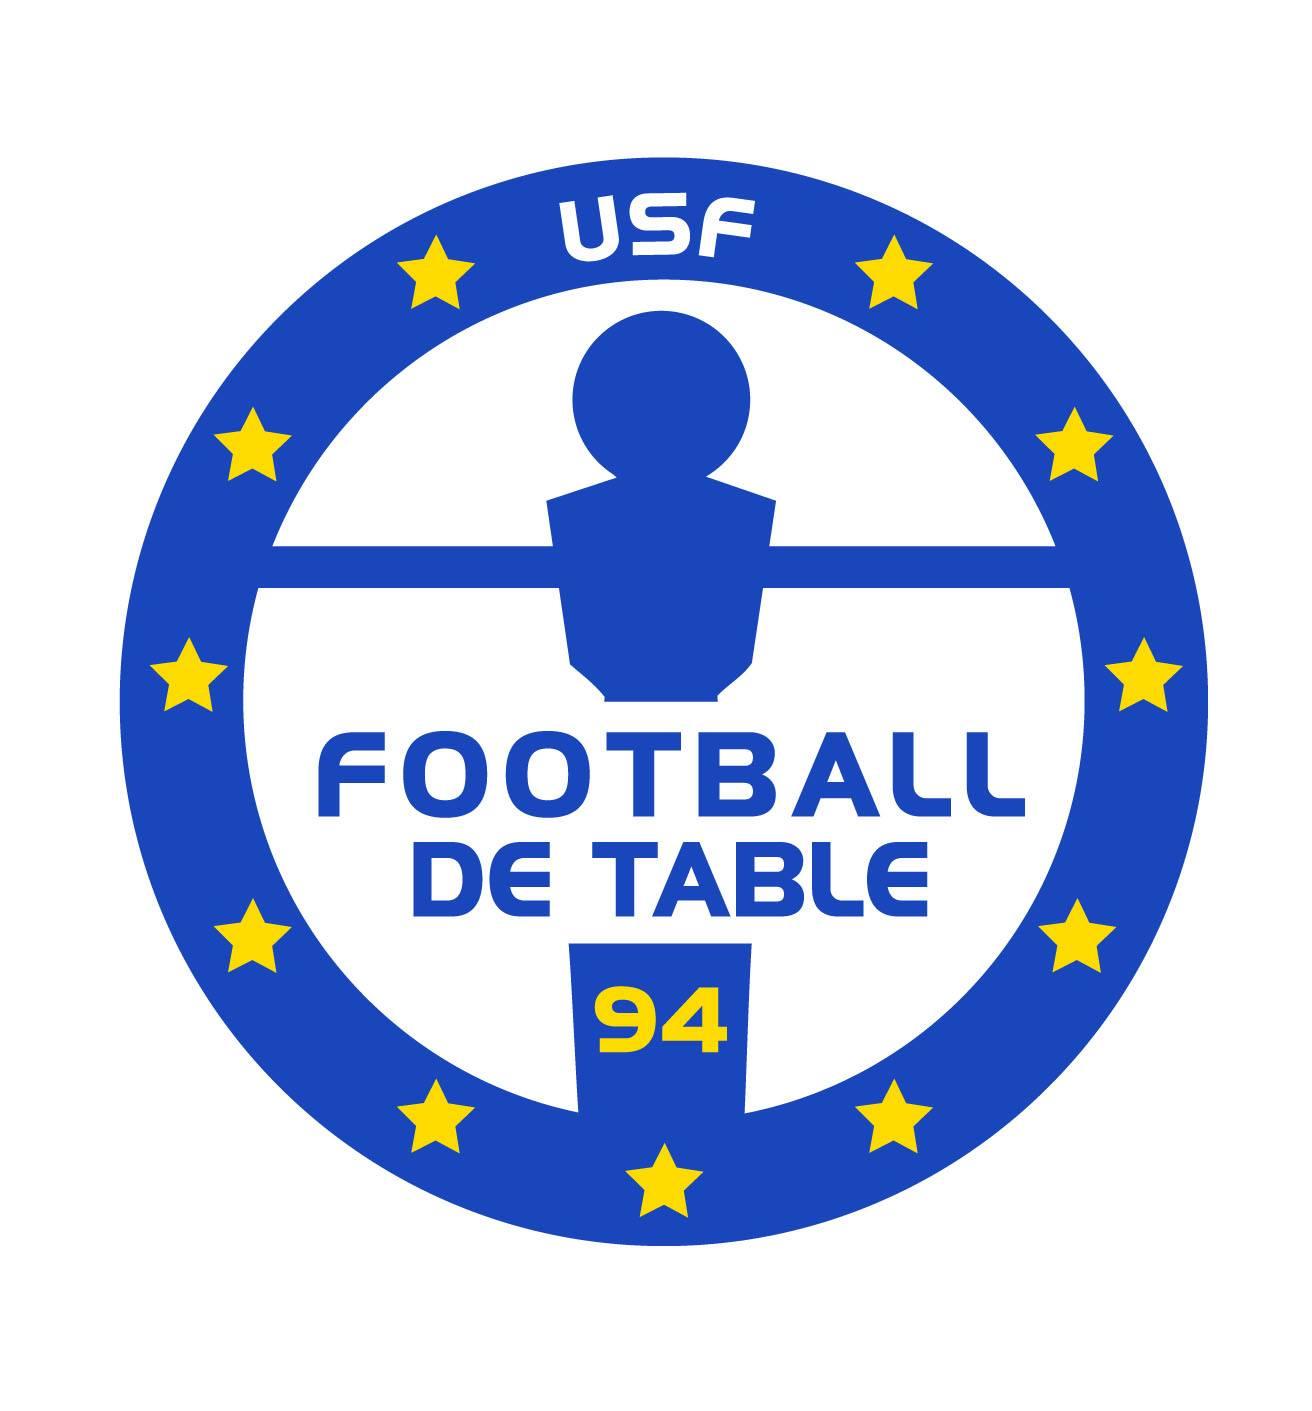 https://static.blog4ever.com/2015/09/808507/USF-Football-de-Table.jpg